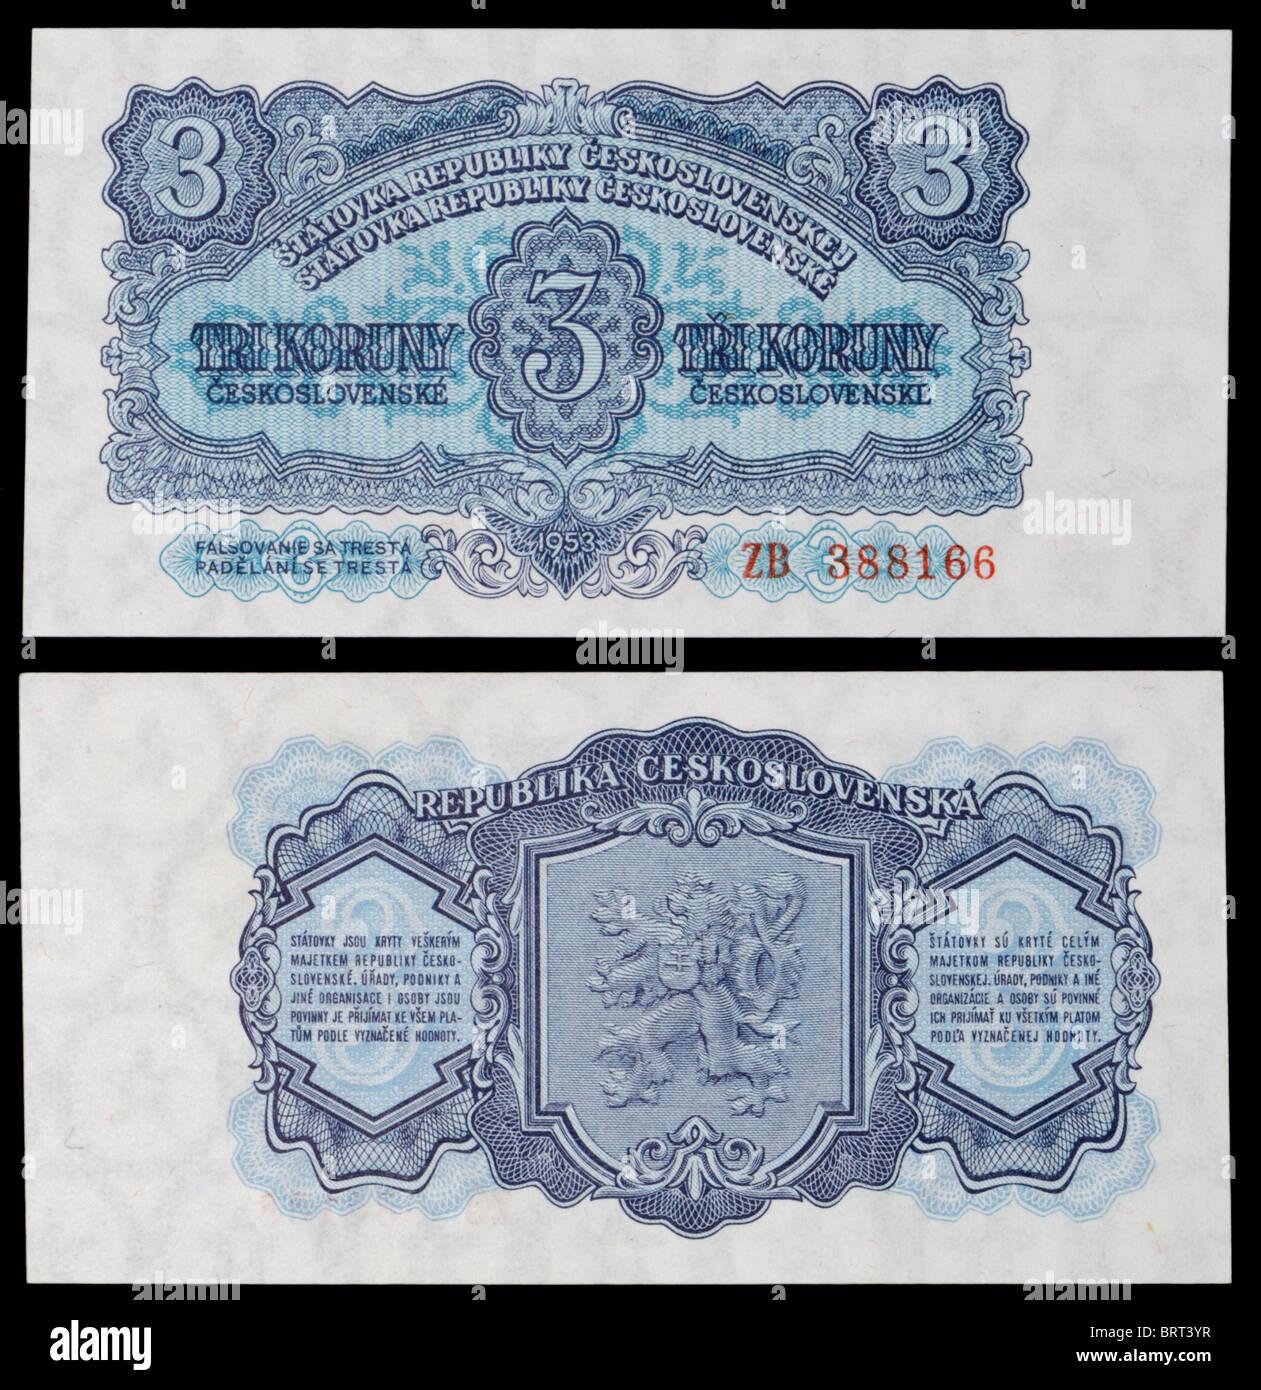 Czechoslovakian banknote from 1953. Tri Koruny / Three Crowns - Stock Image